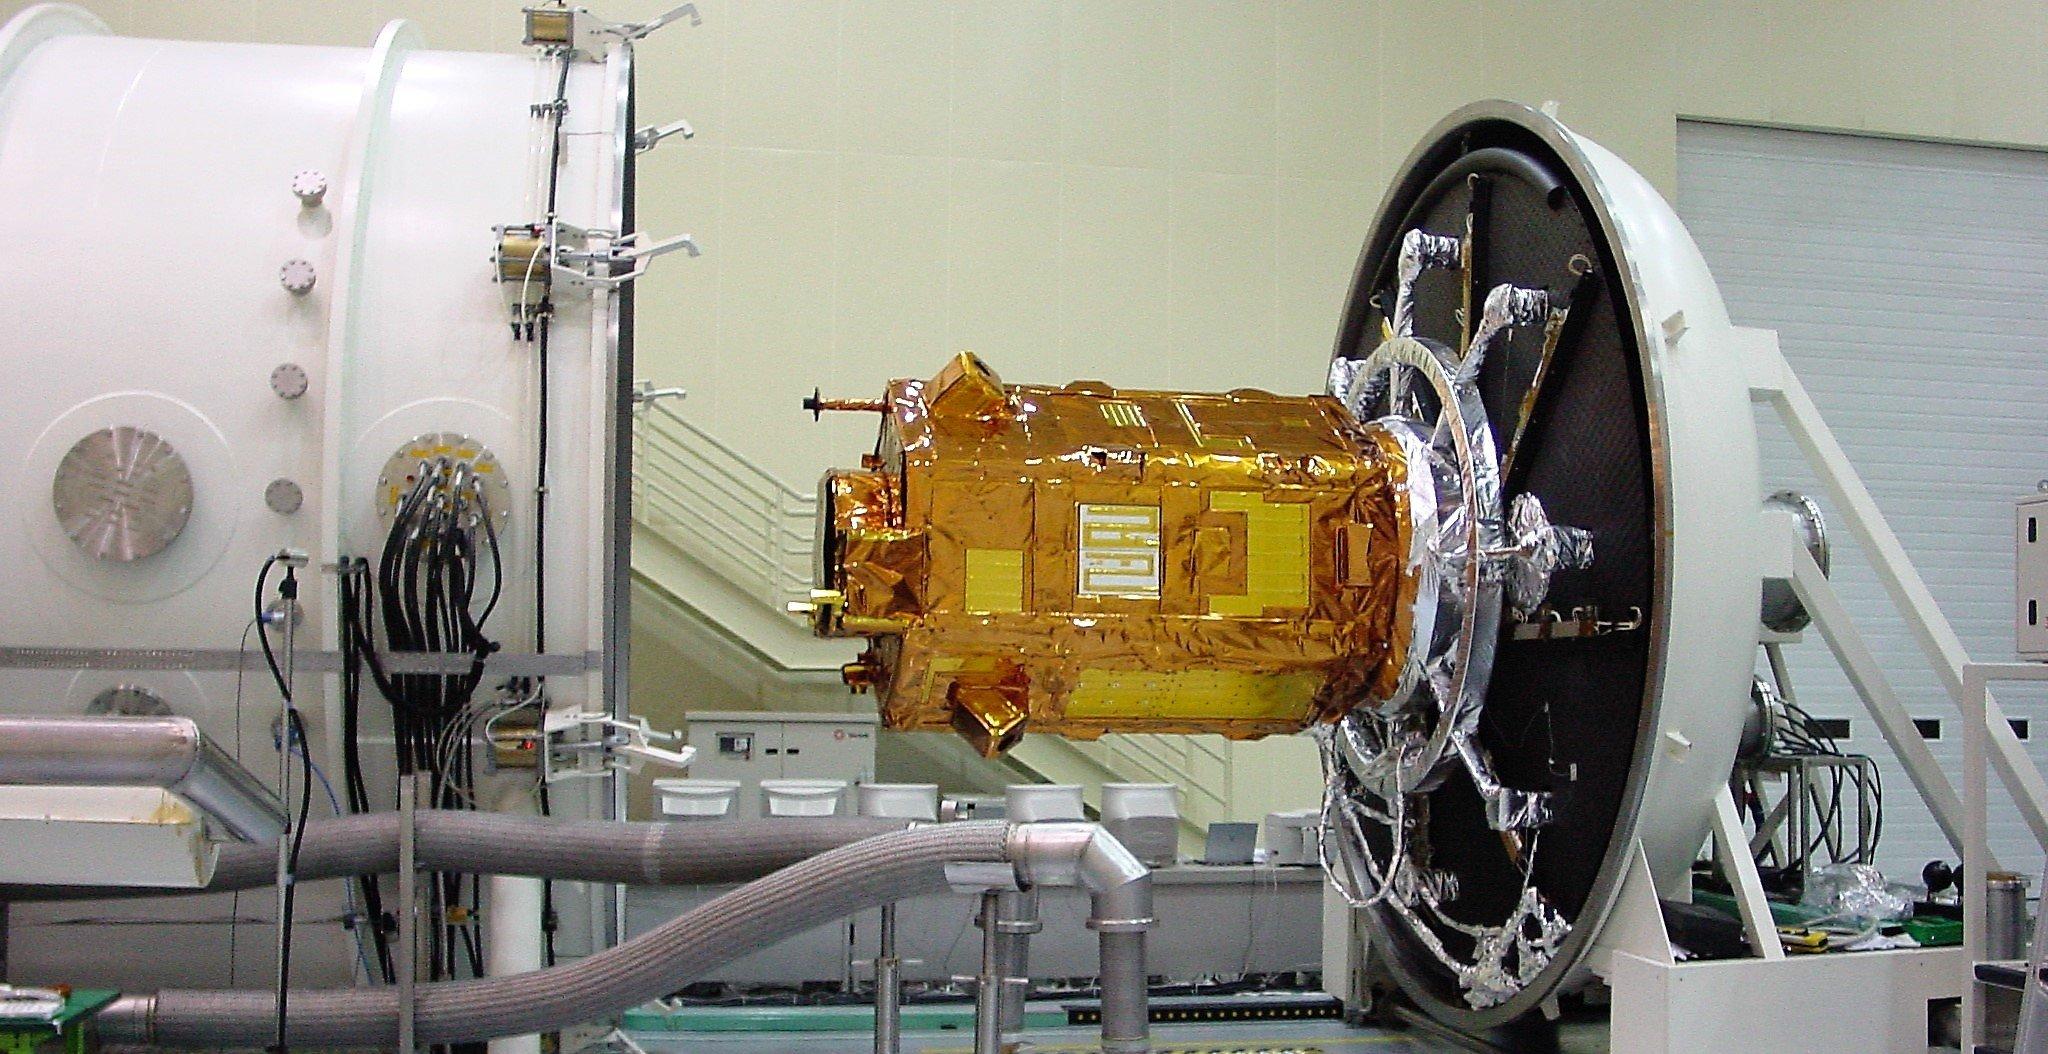 Simulatore_spaziale_prove_satelliti2